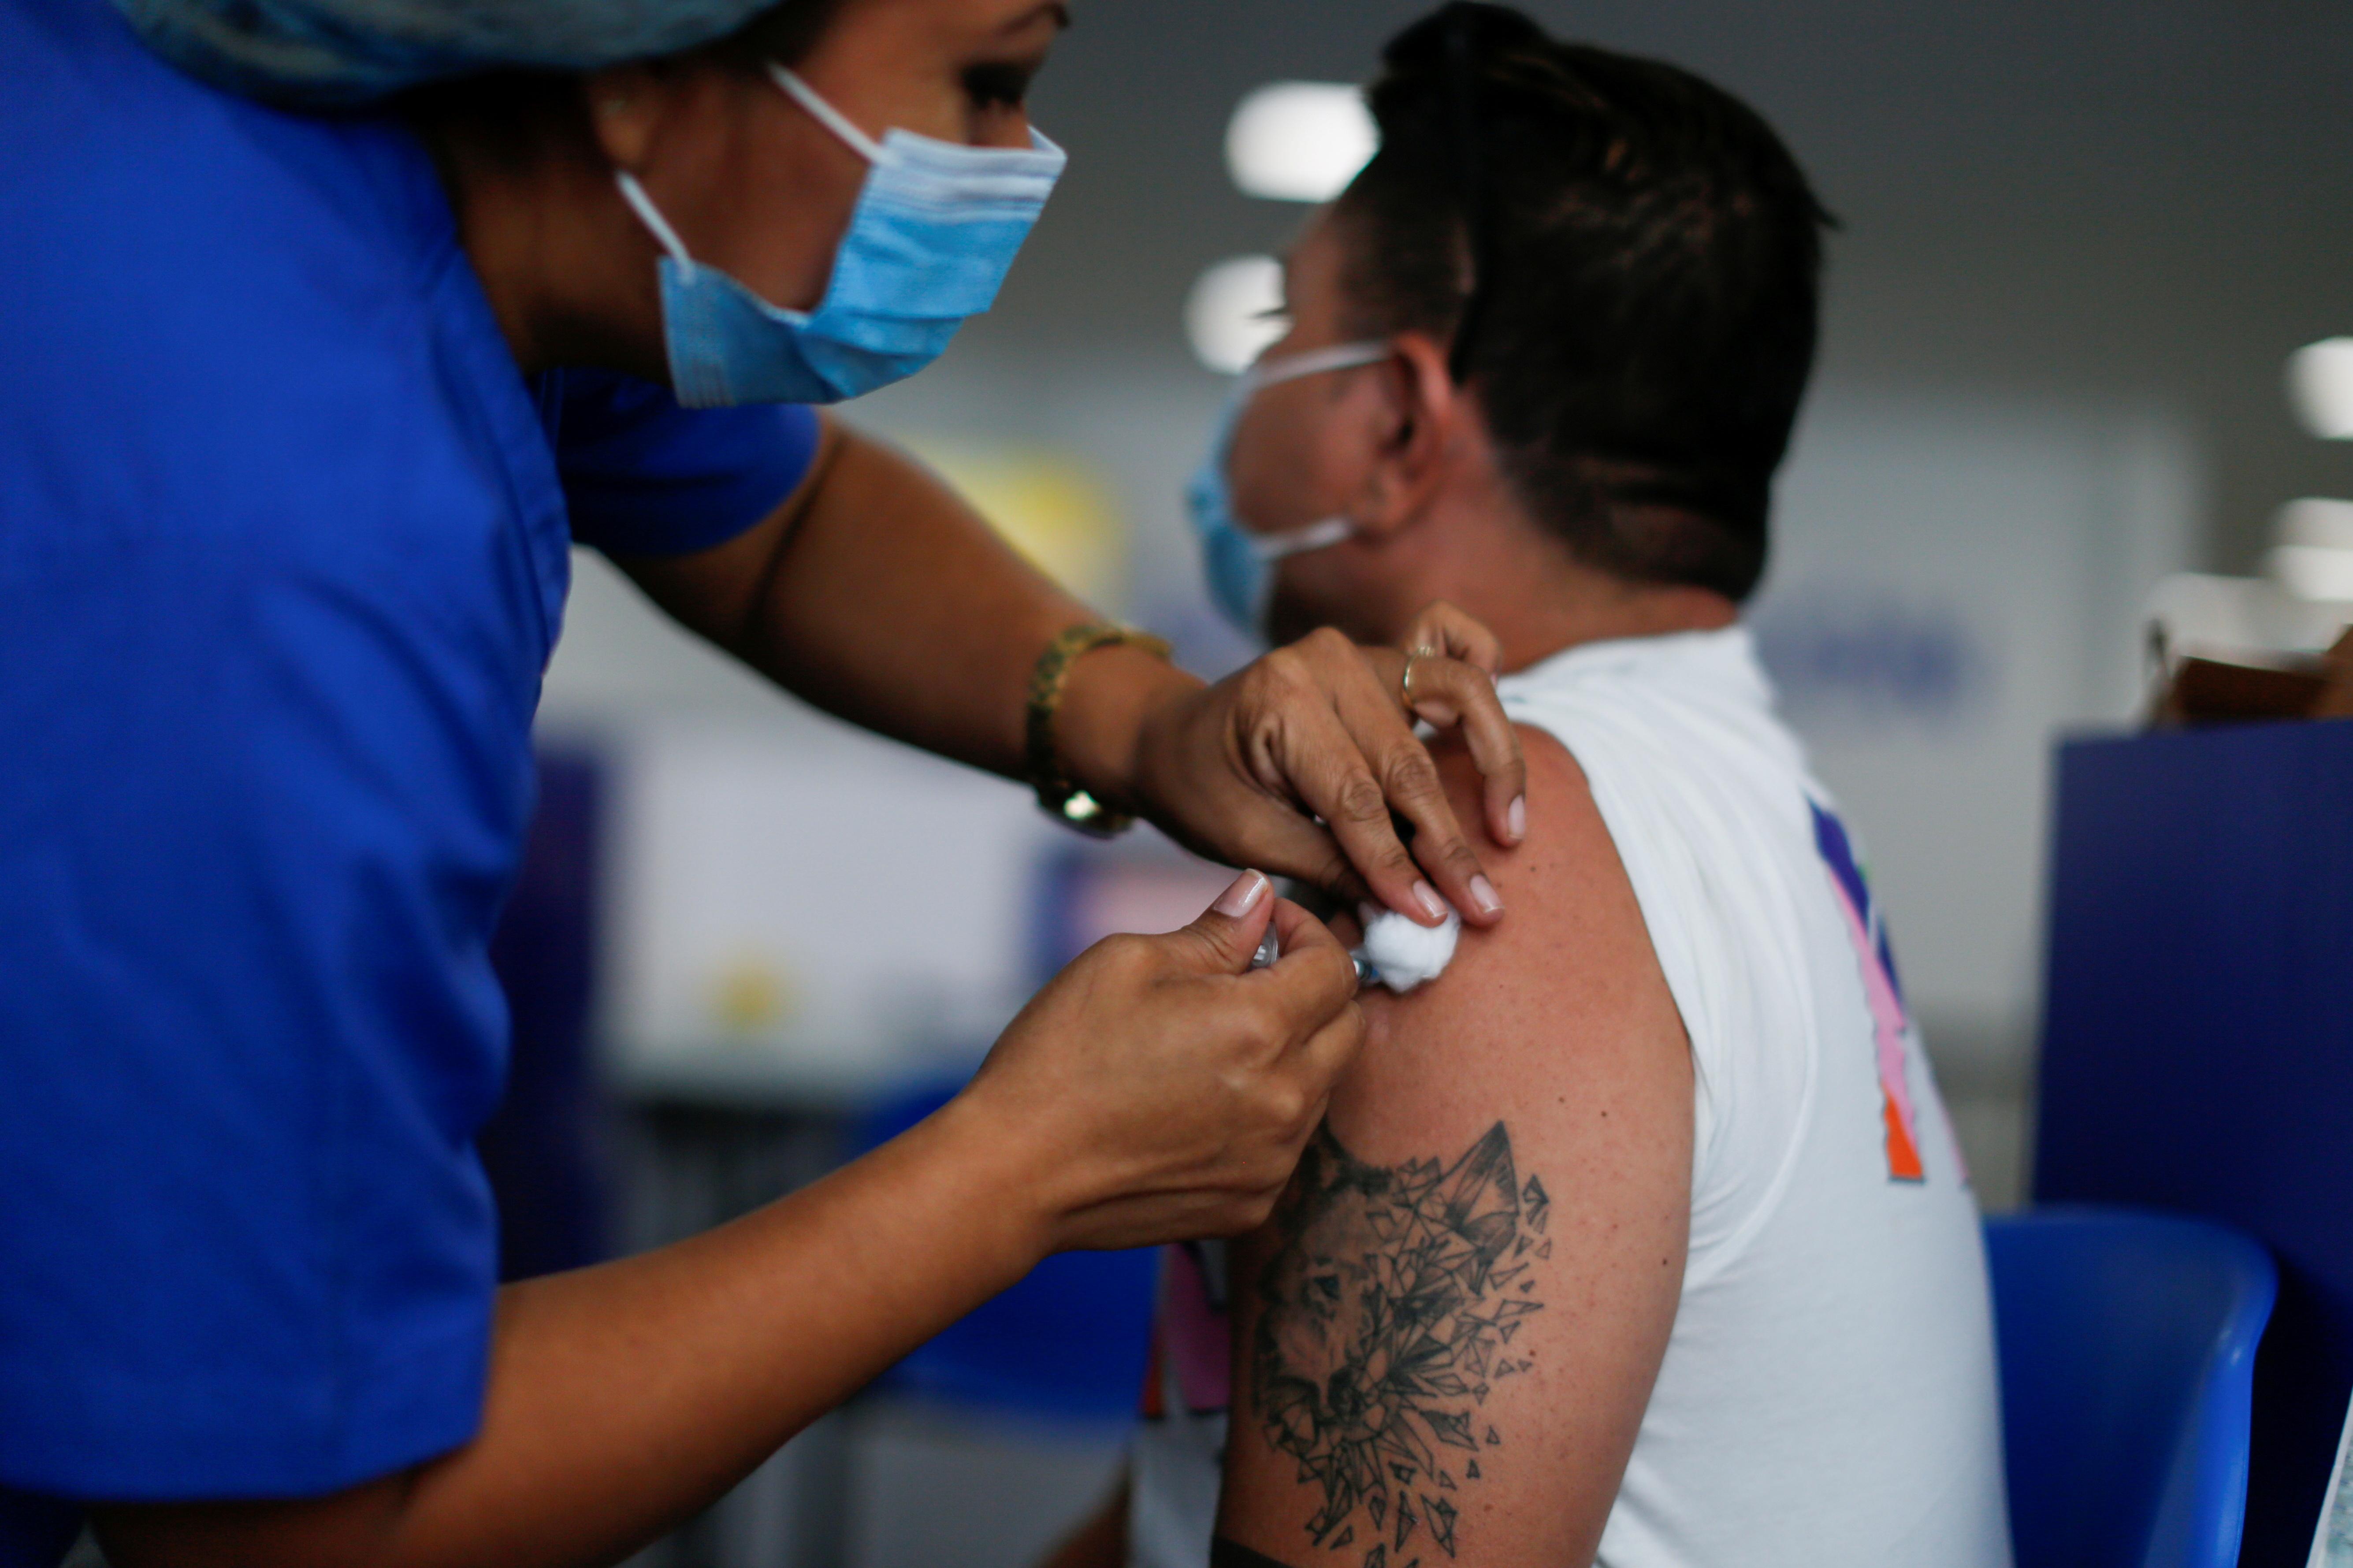 A healthcare worker applies a dose of the AstraZeneca coronavirus disease (COVID-19) vaccine in a vaccination center in San Salvador, El Salvador, June 22, 2021. REUTERS/Jose Cabezas